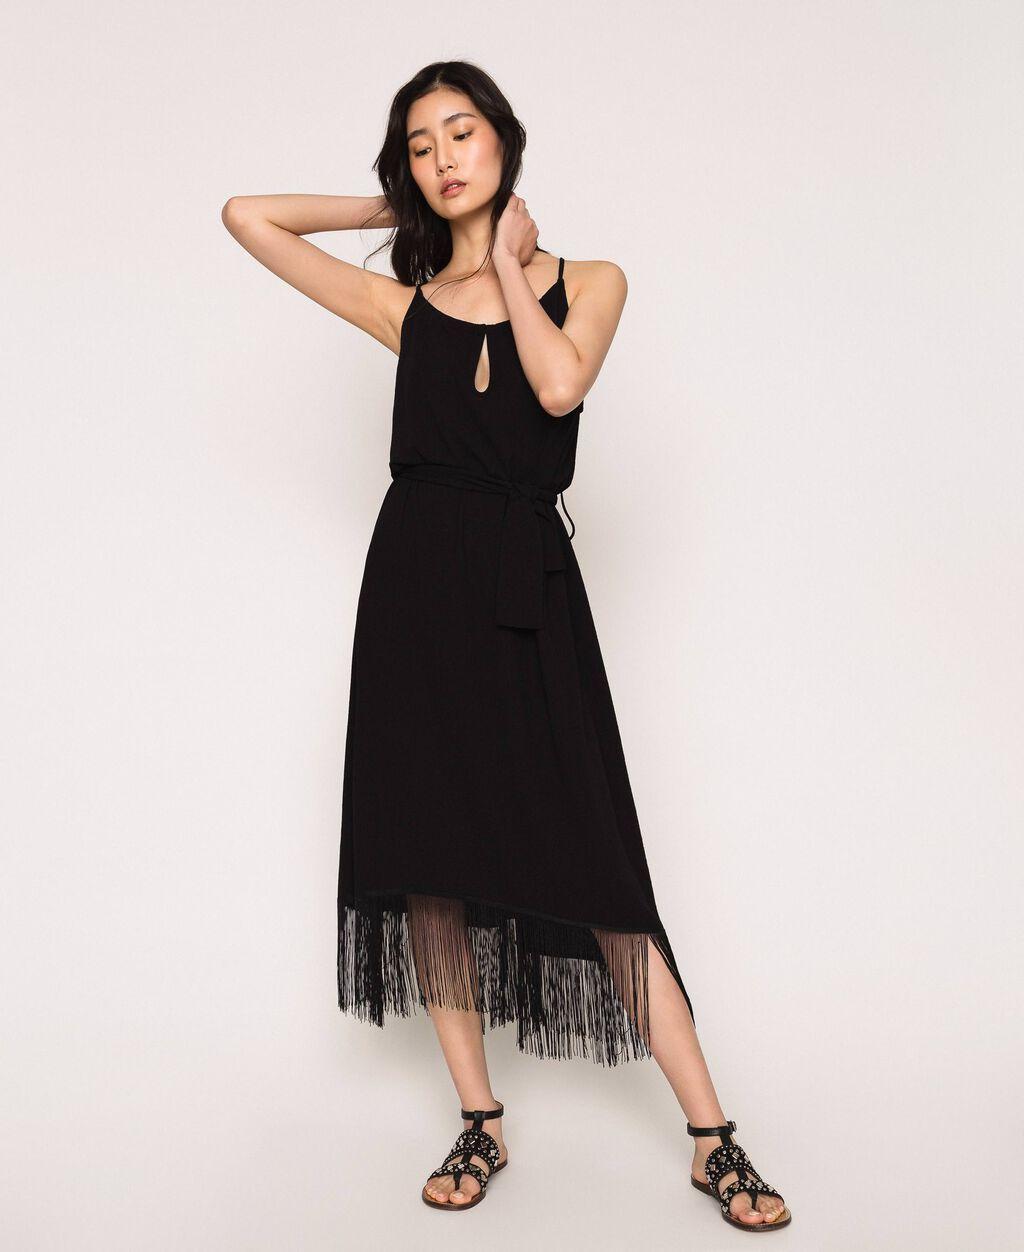 Mini dress with fringes